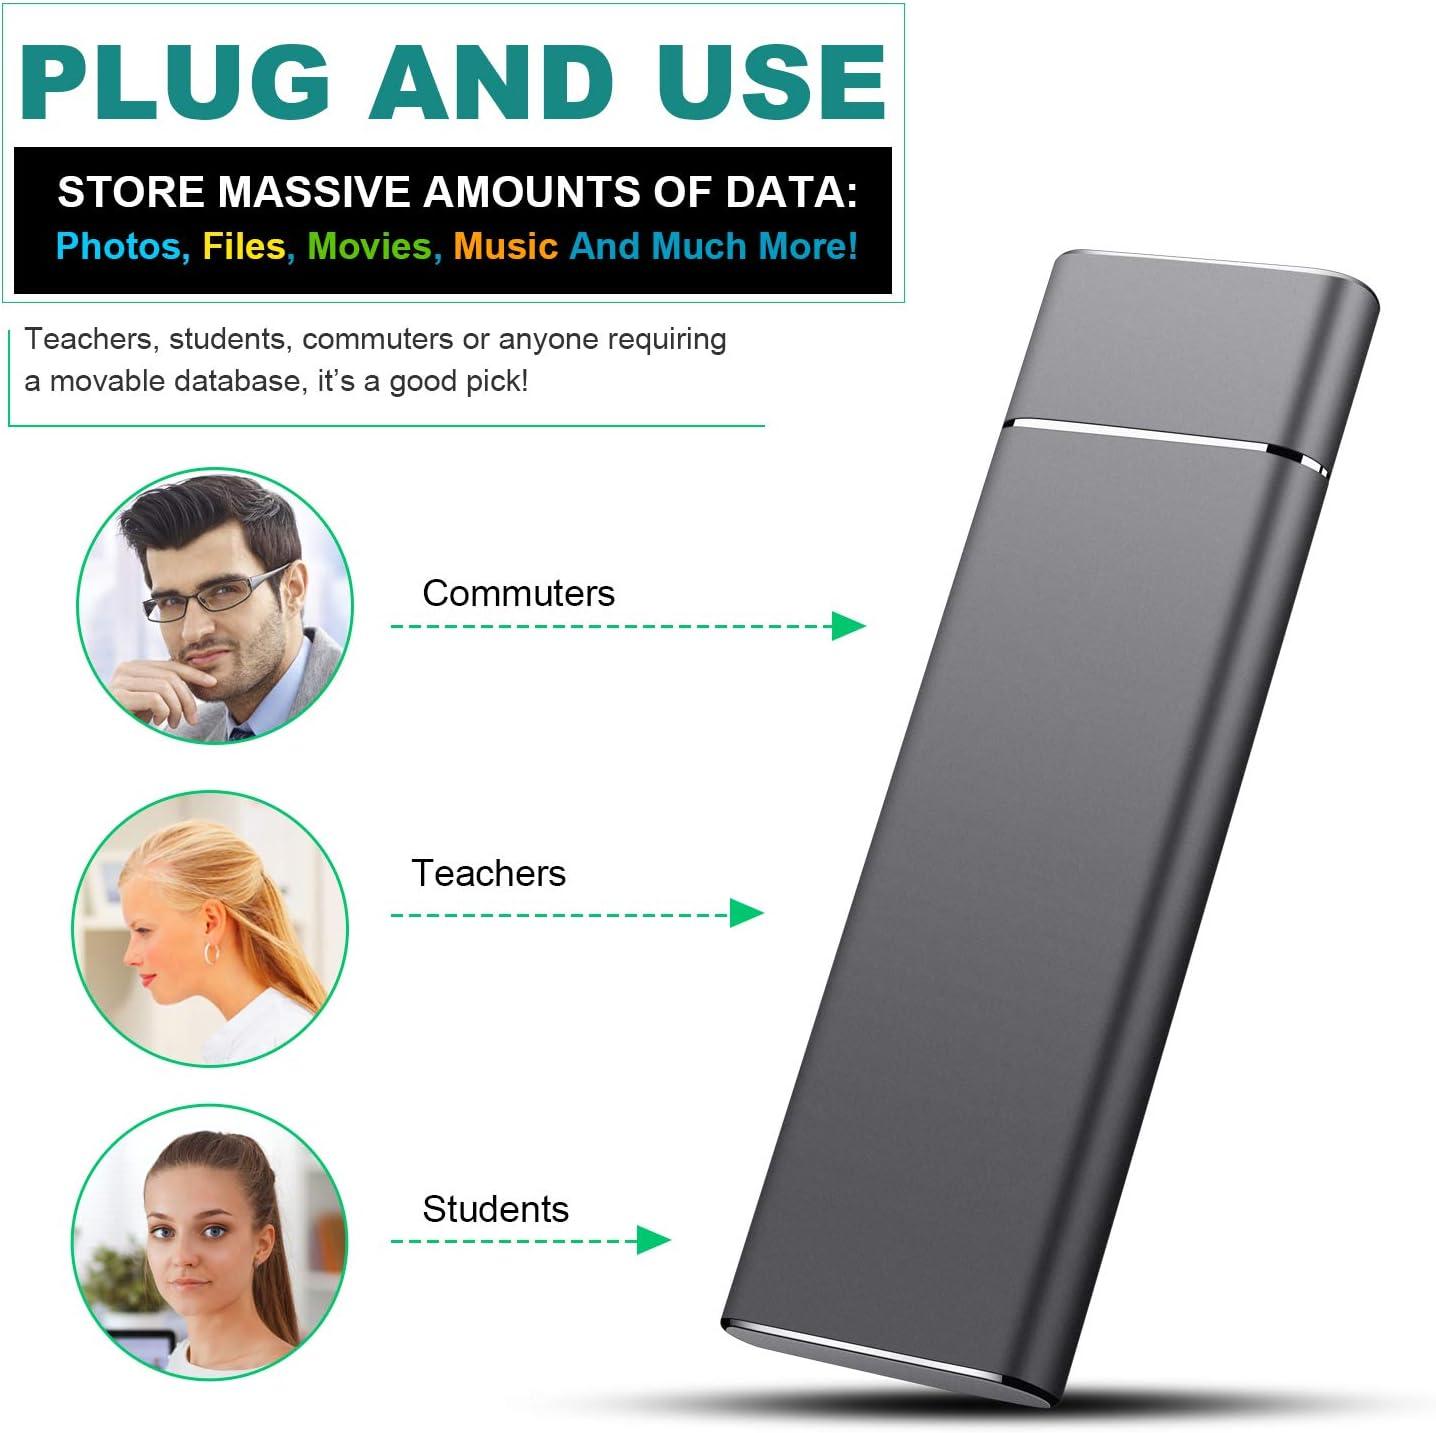 PC Xbox one Type-C USB 3.1 Gen1 Ultra Slim Portable HDD for Mac External Hard Drive 2TB Portable Hard Drive Desktop 2TB, Silver